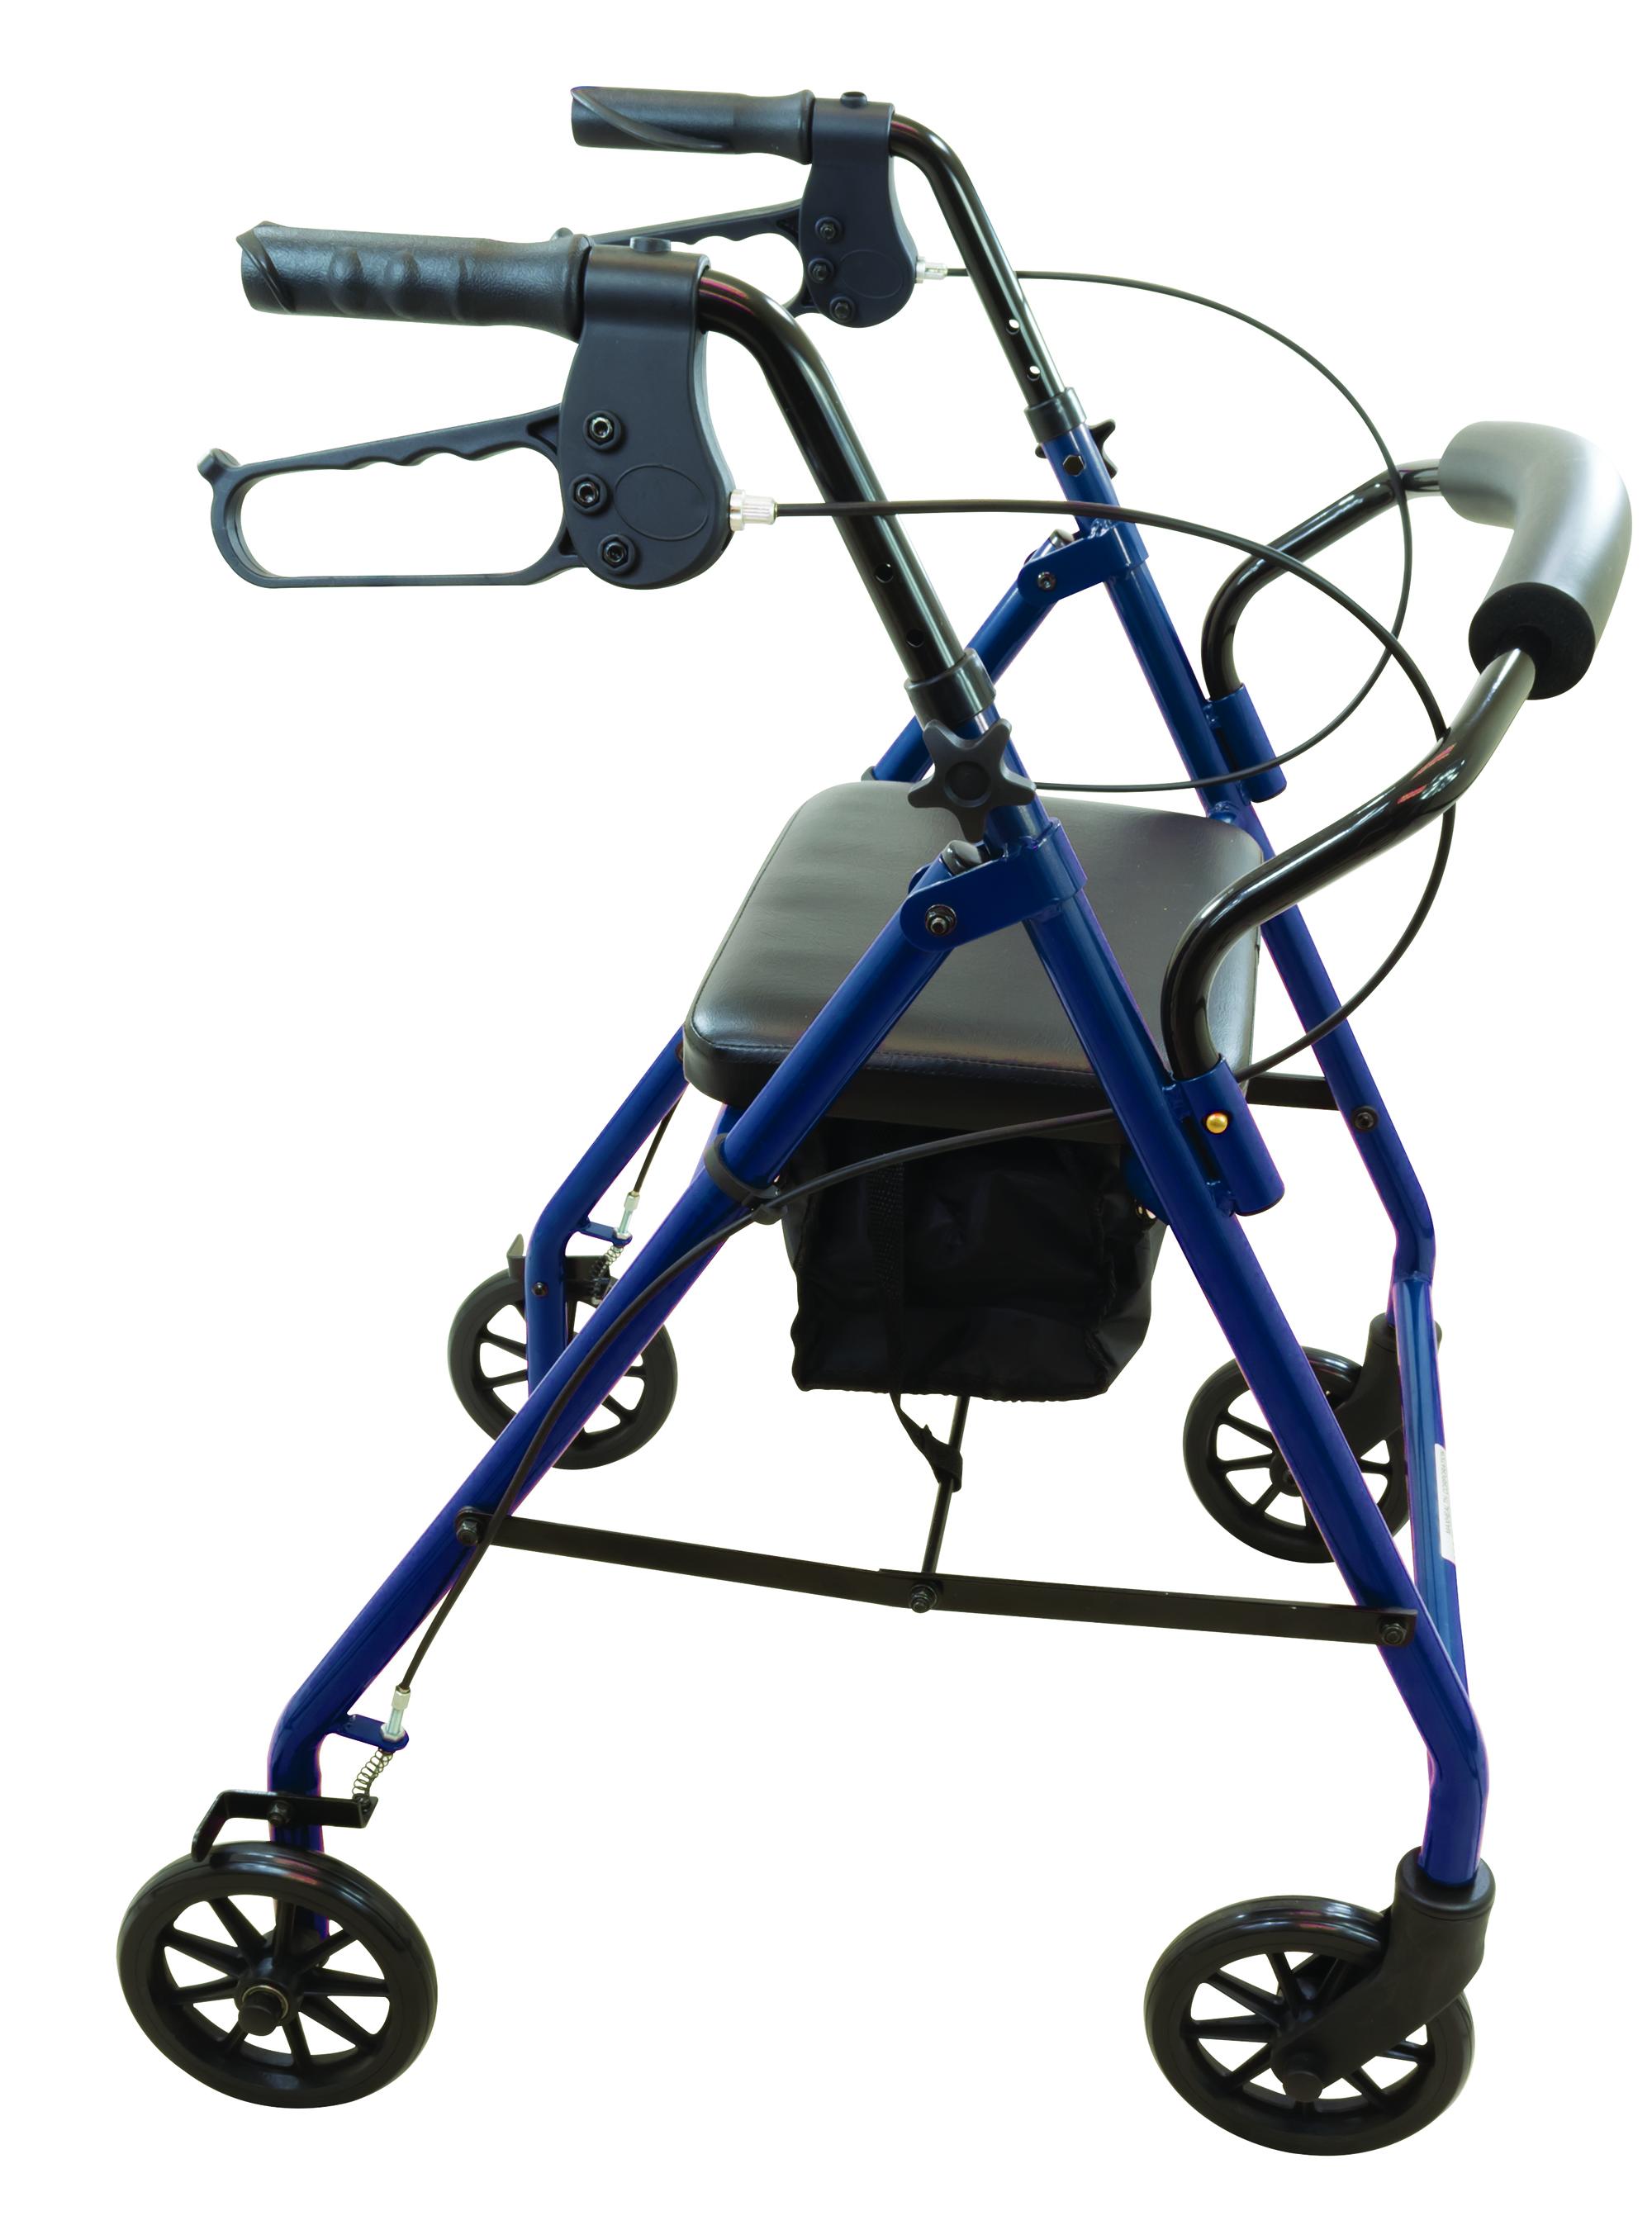 ProBasics Steel Rollator 6″ Wheels Burgundy & Blue 300 lb Weight Capacity Walker Michigan USA